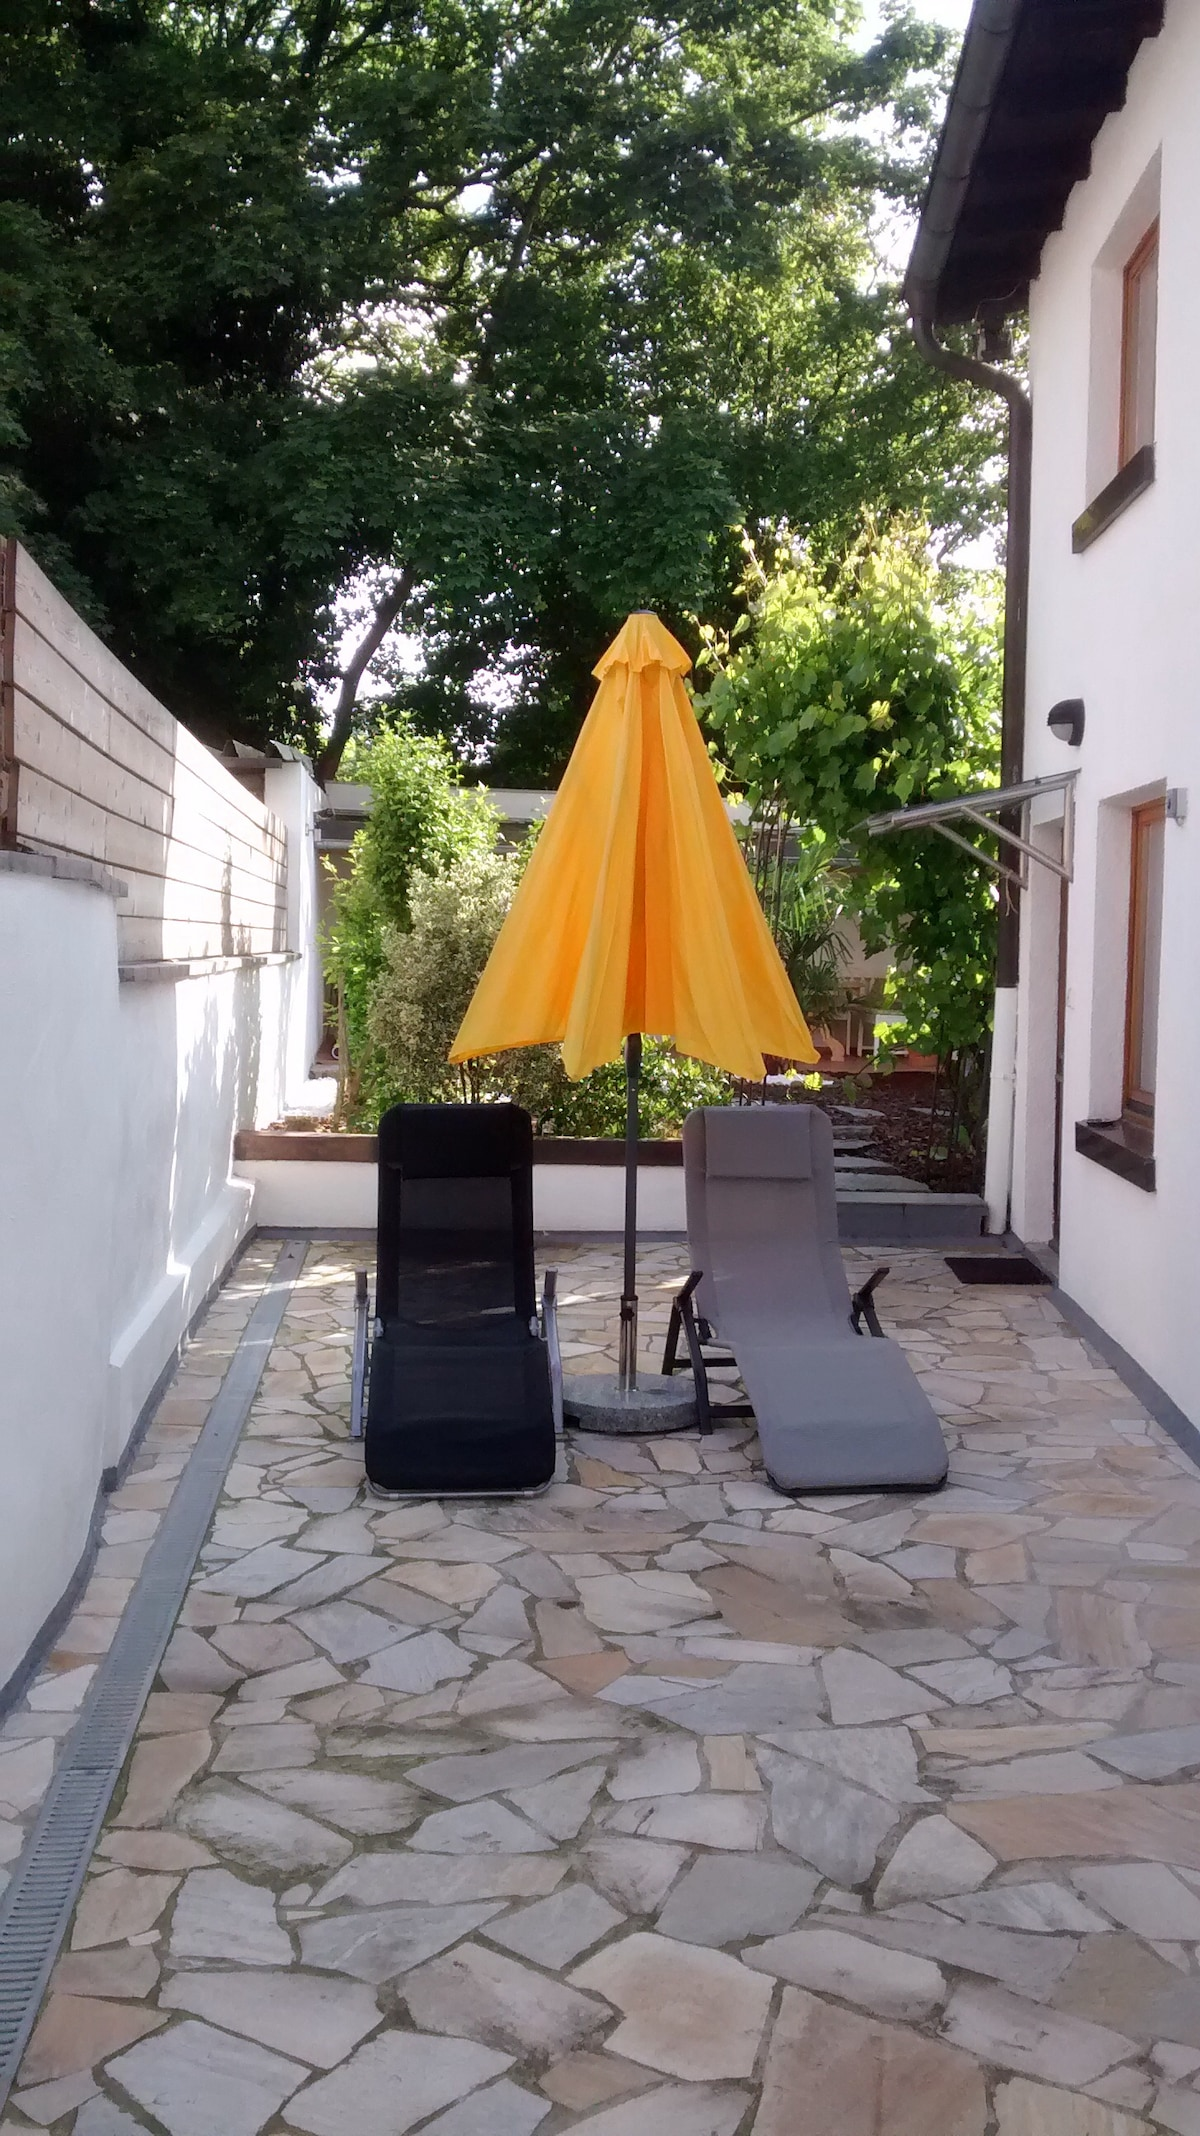 Innenhof - courtyard